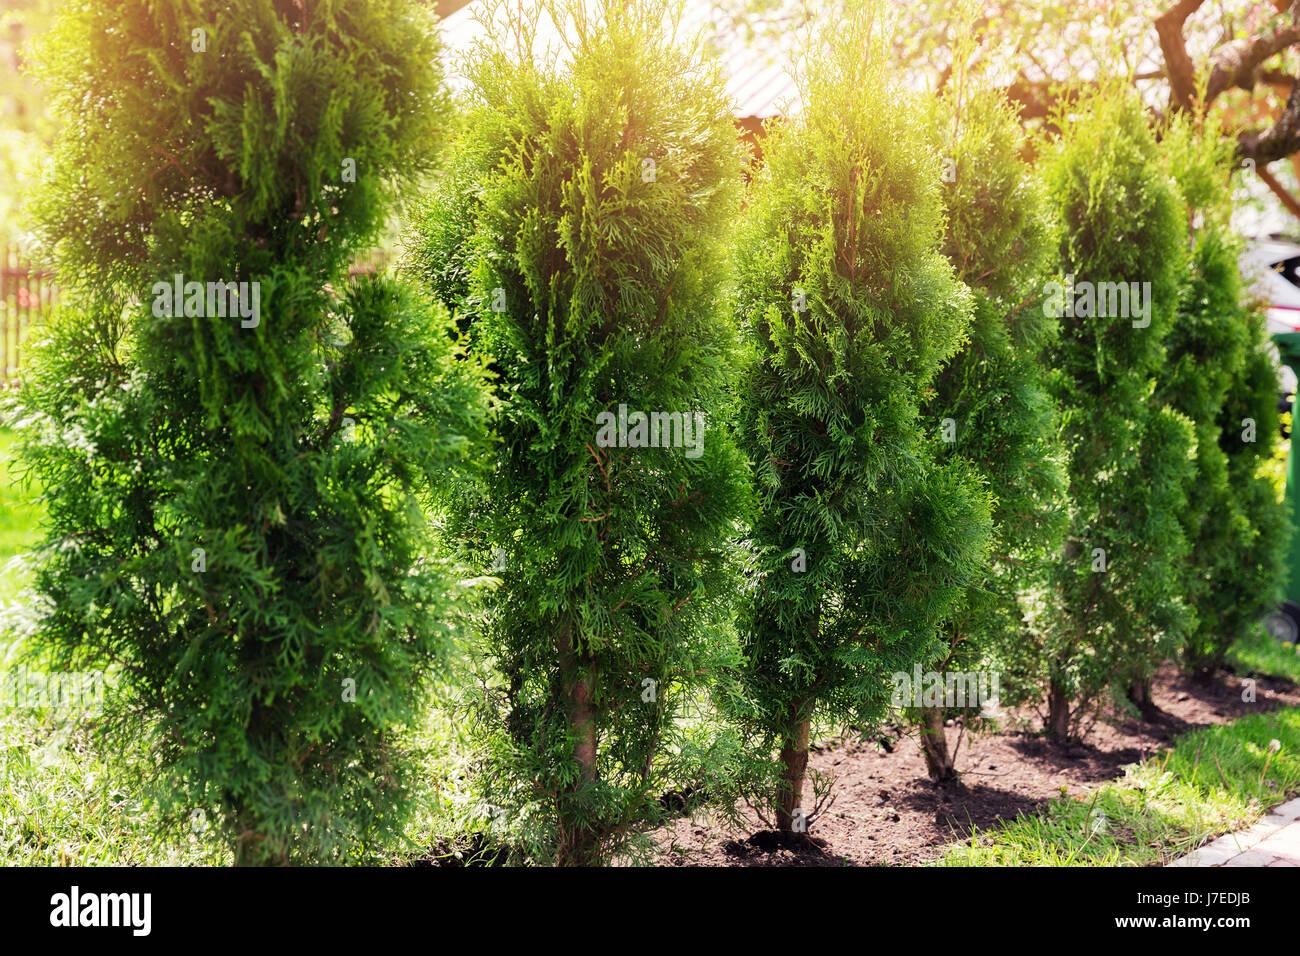 evergreen hedge of thuja trees - Stock Image